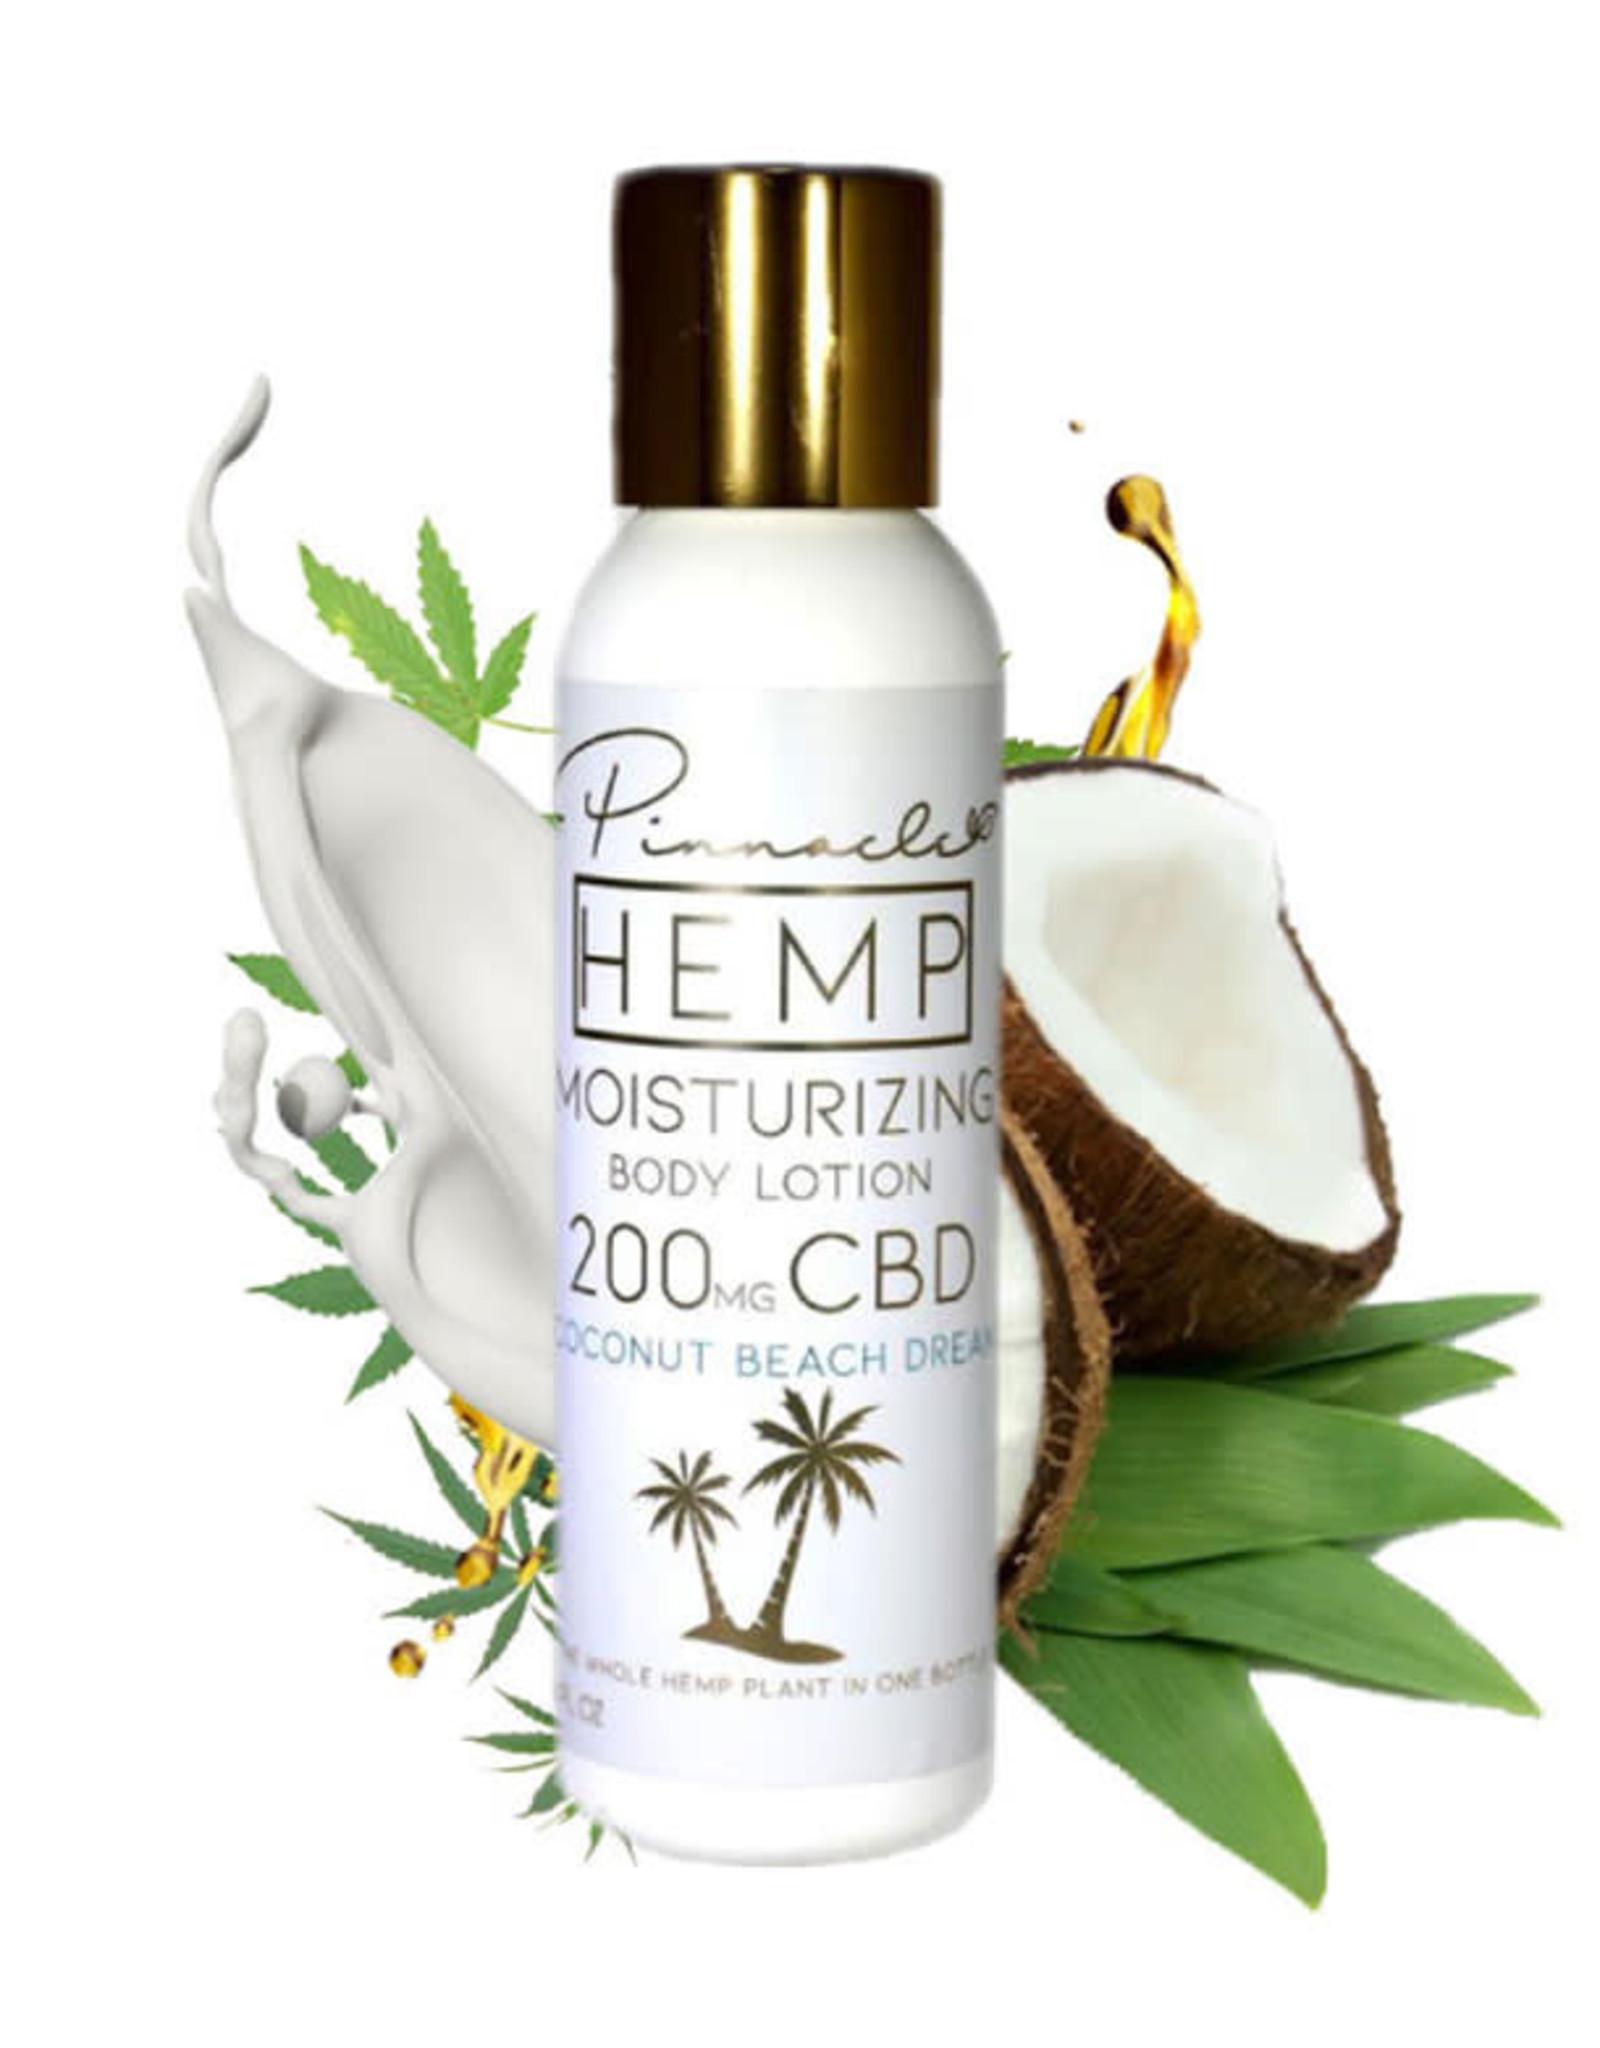 Pinnacle Hemp Full Spectrum CBD Body Lotion Coconut Beach Scent 4oz 200mg